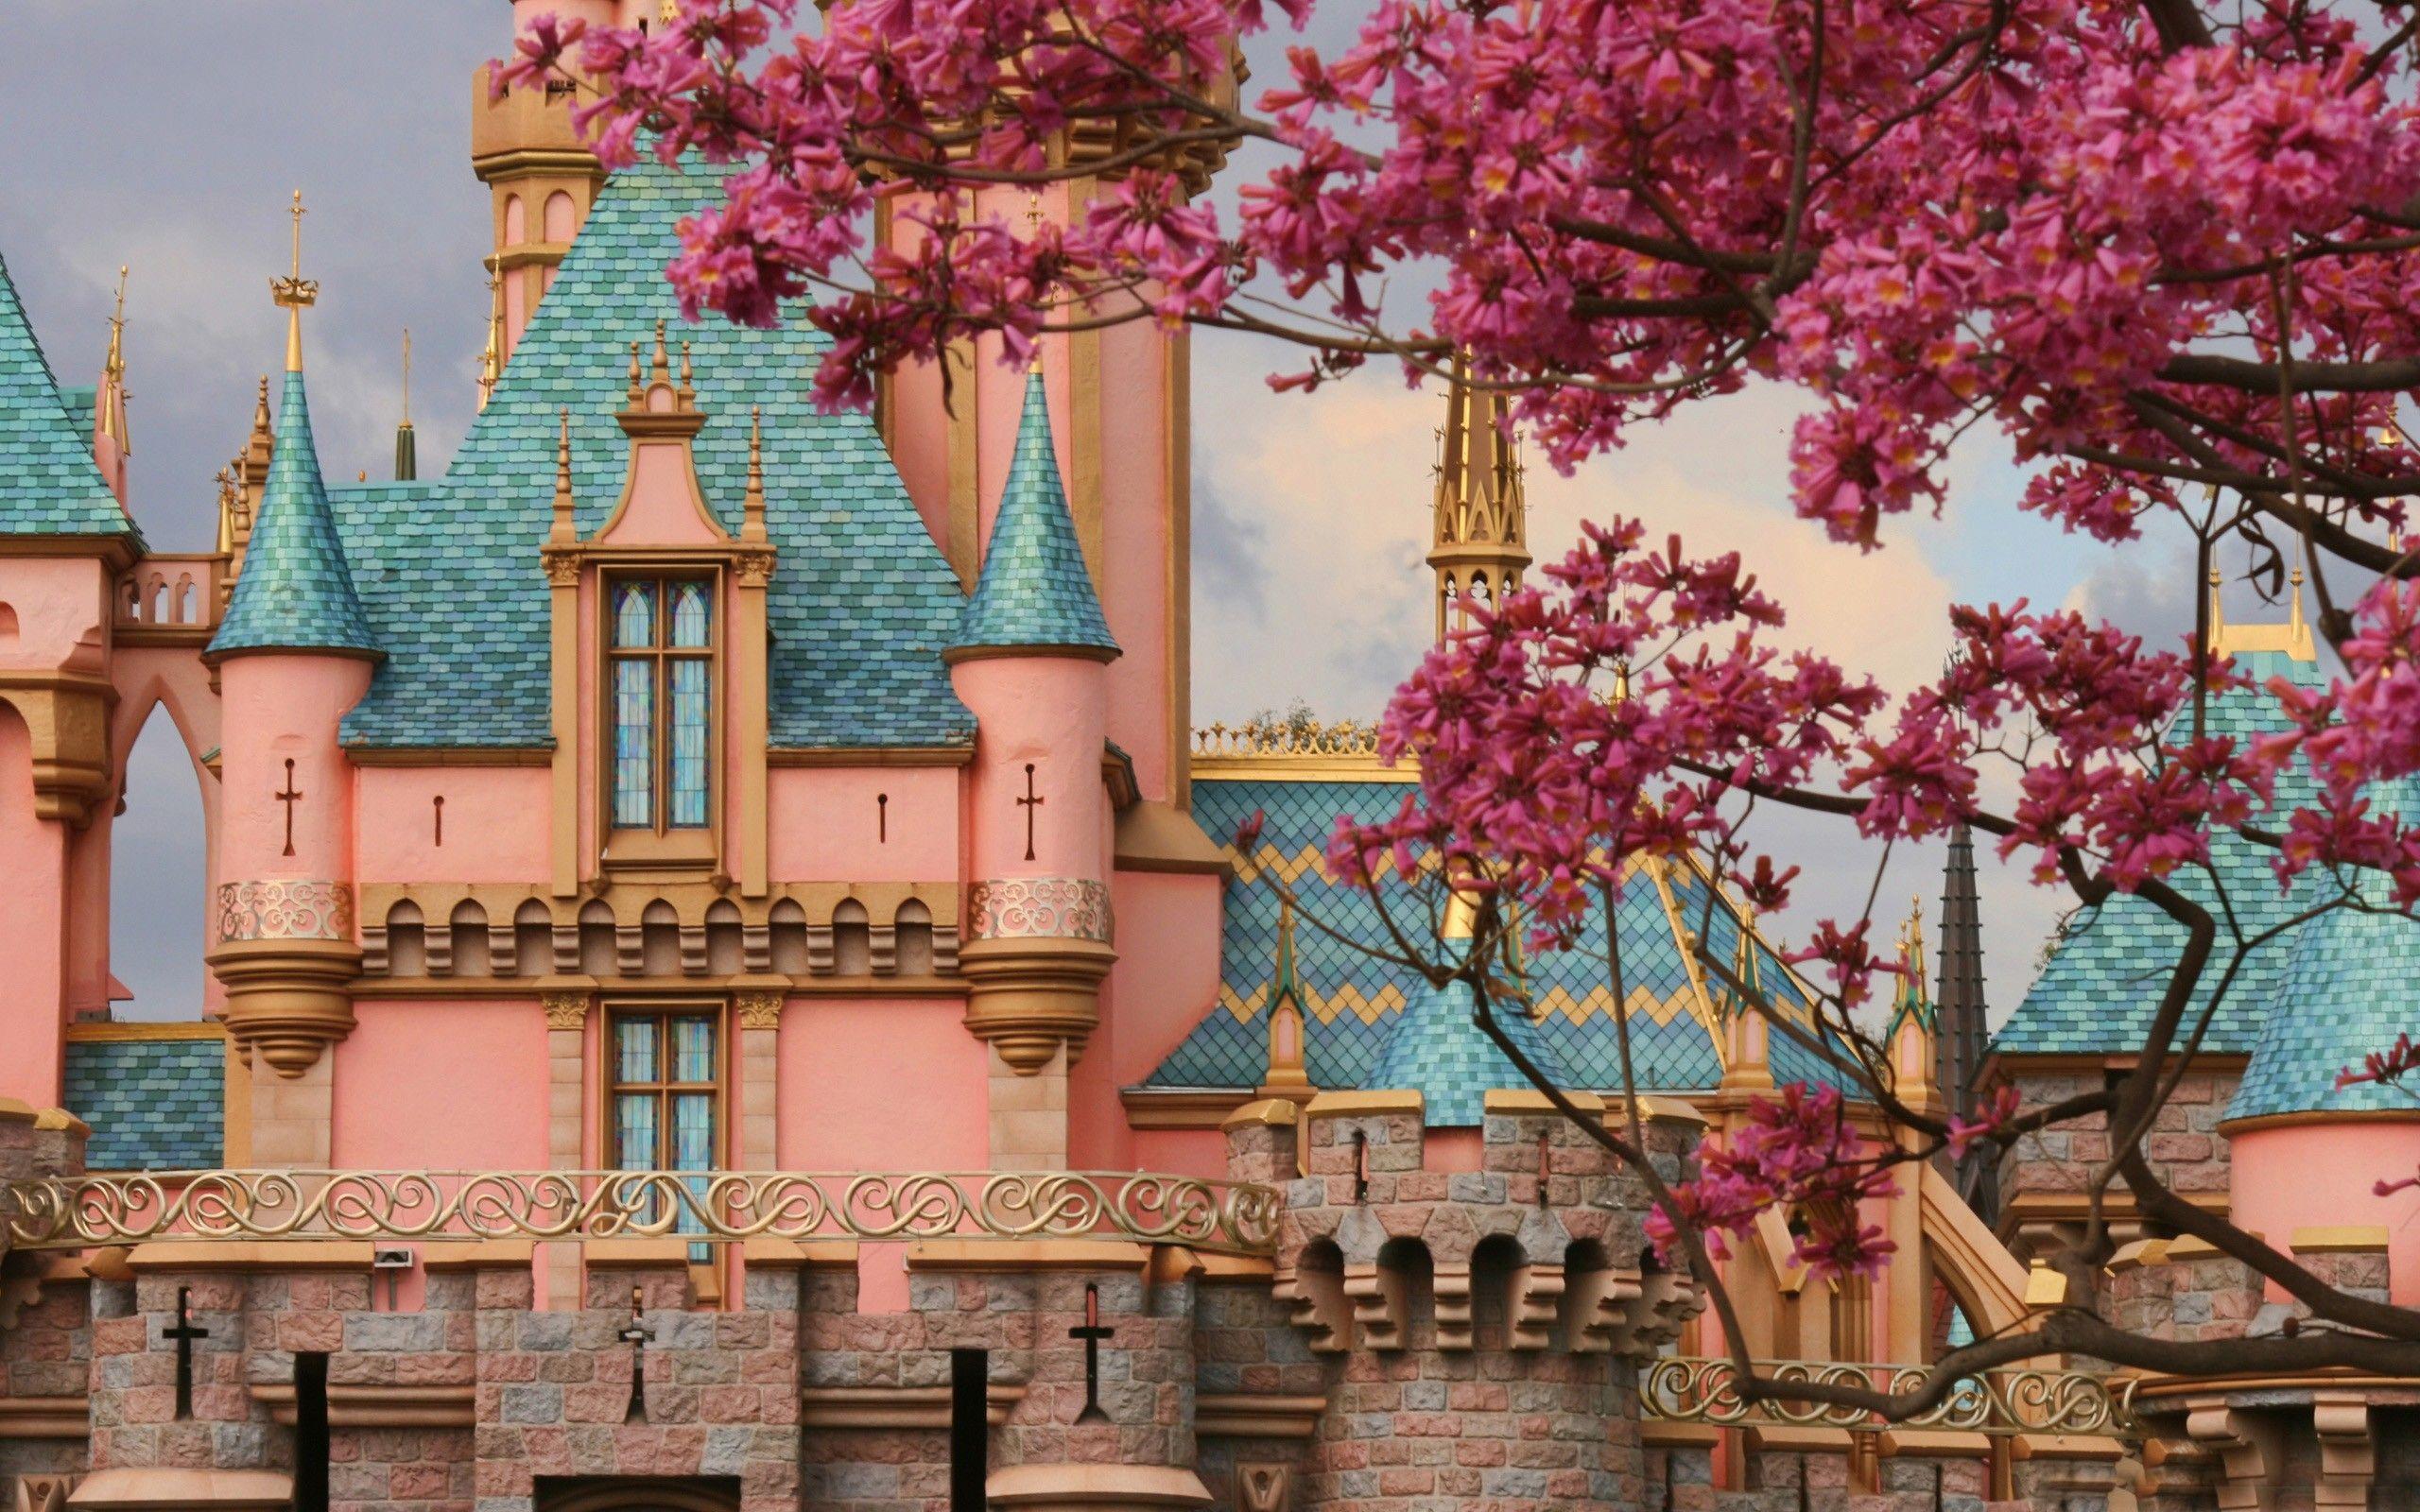 Pink Fairy Tale Castle Disneyland Wallpaper Spring Wallpaper Desktop Wallpapers Backgrounds